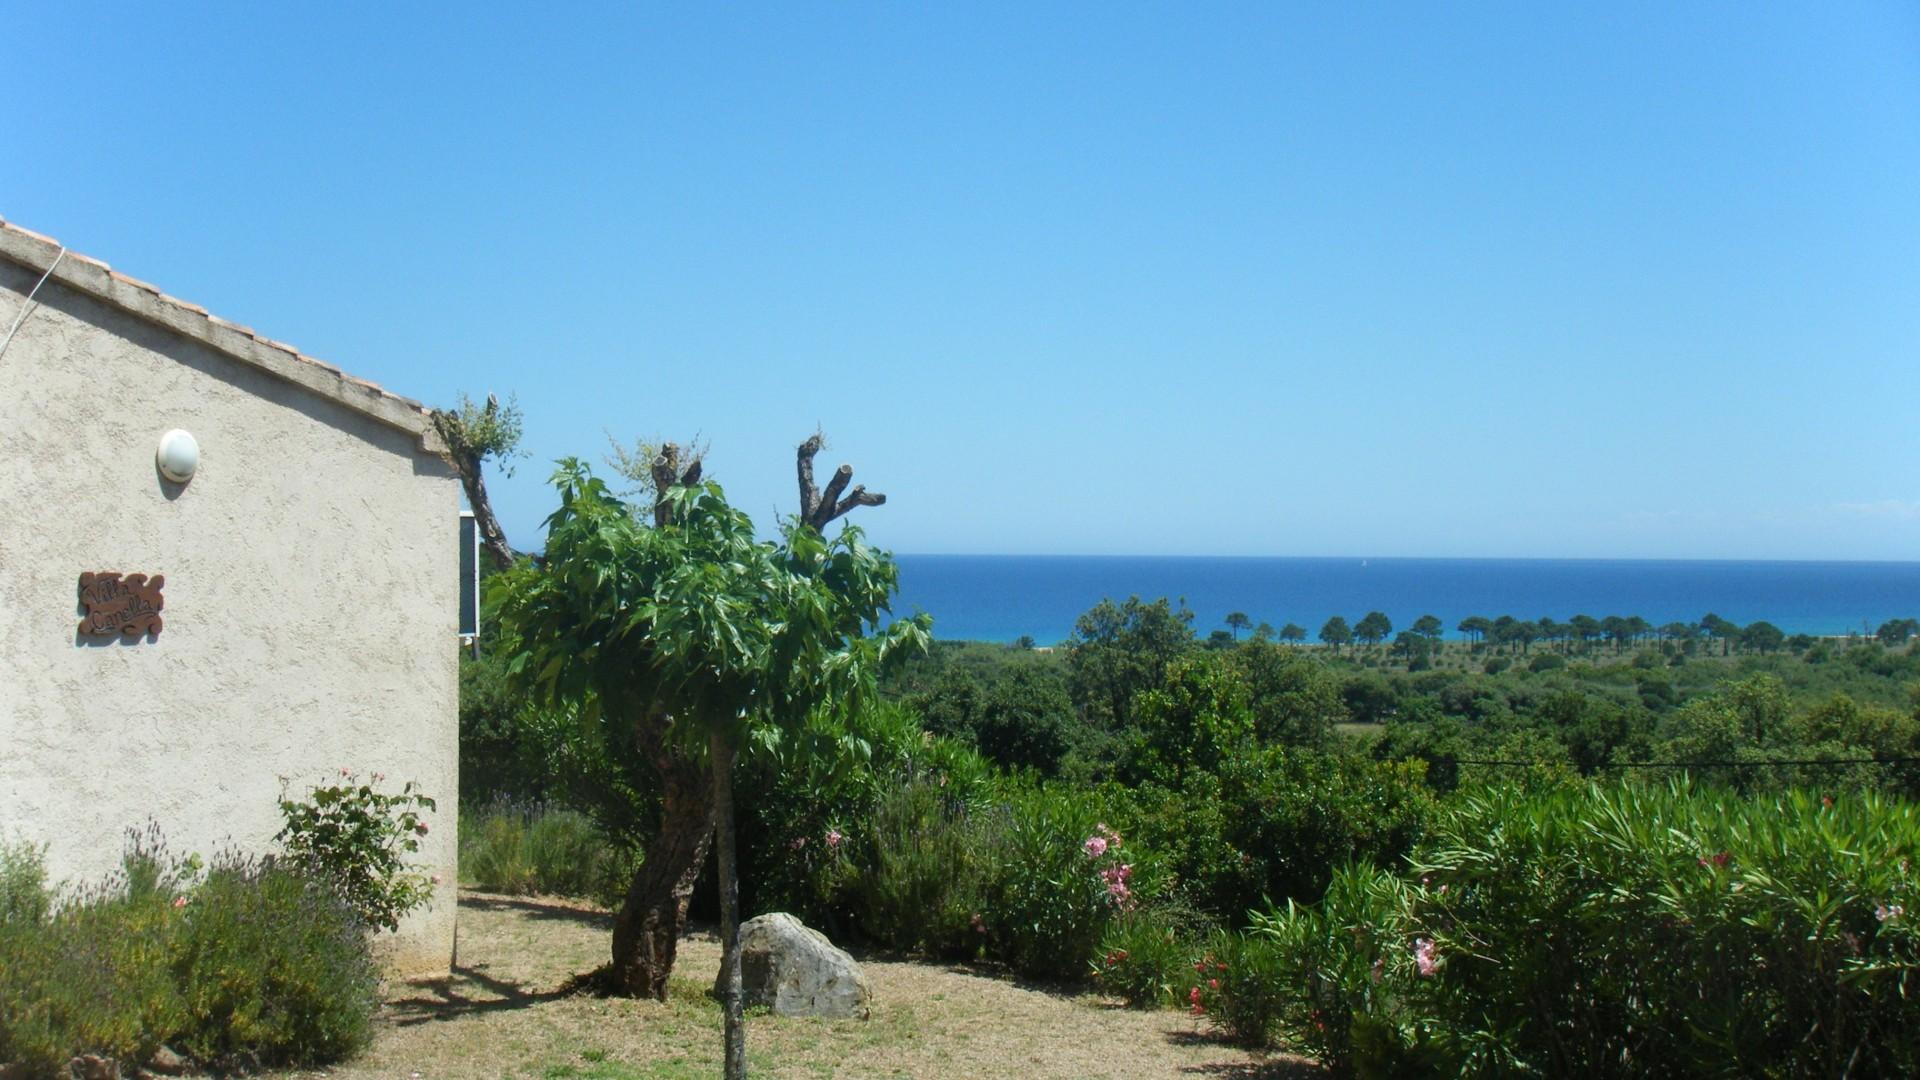 Ferienhaus mieten Korsika